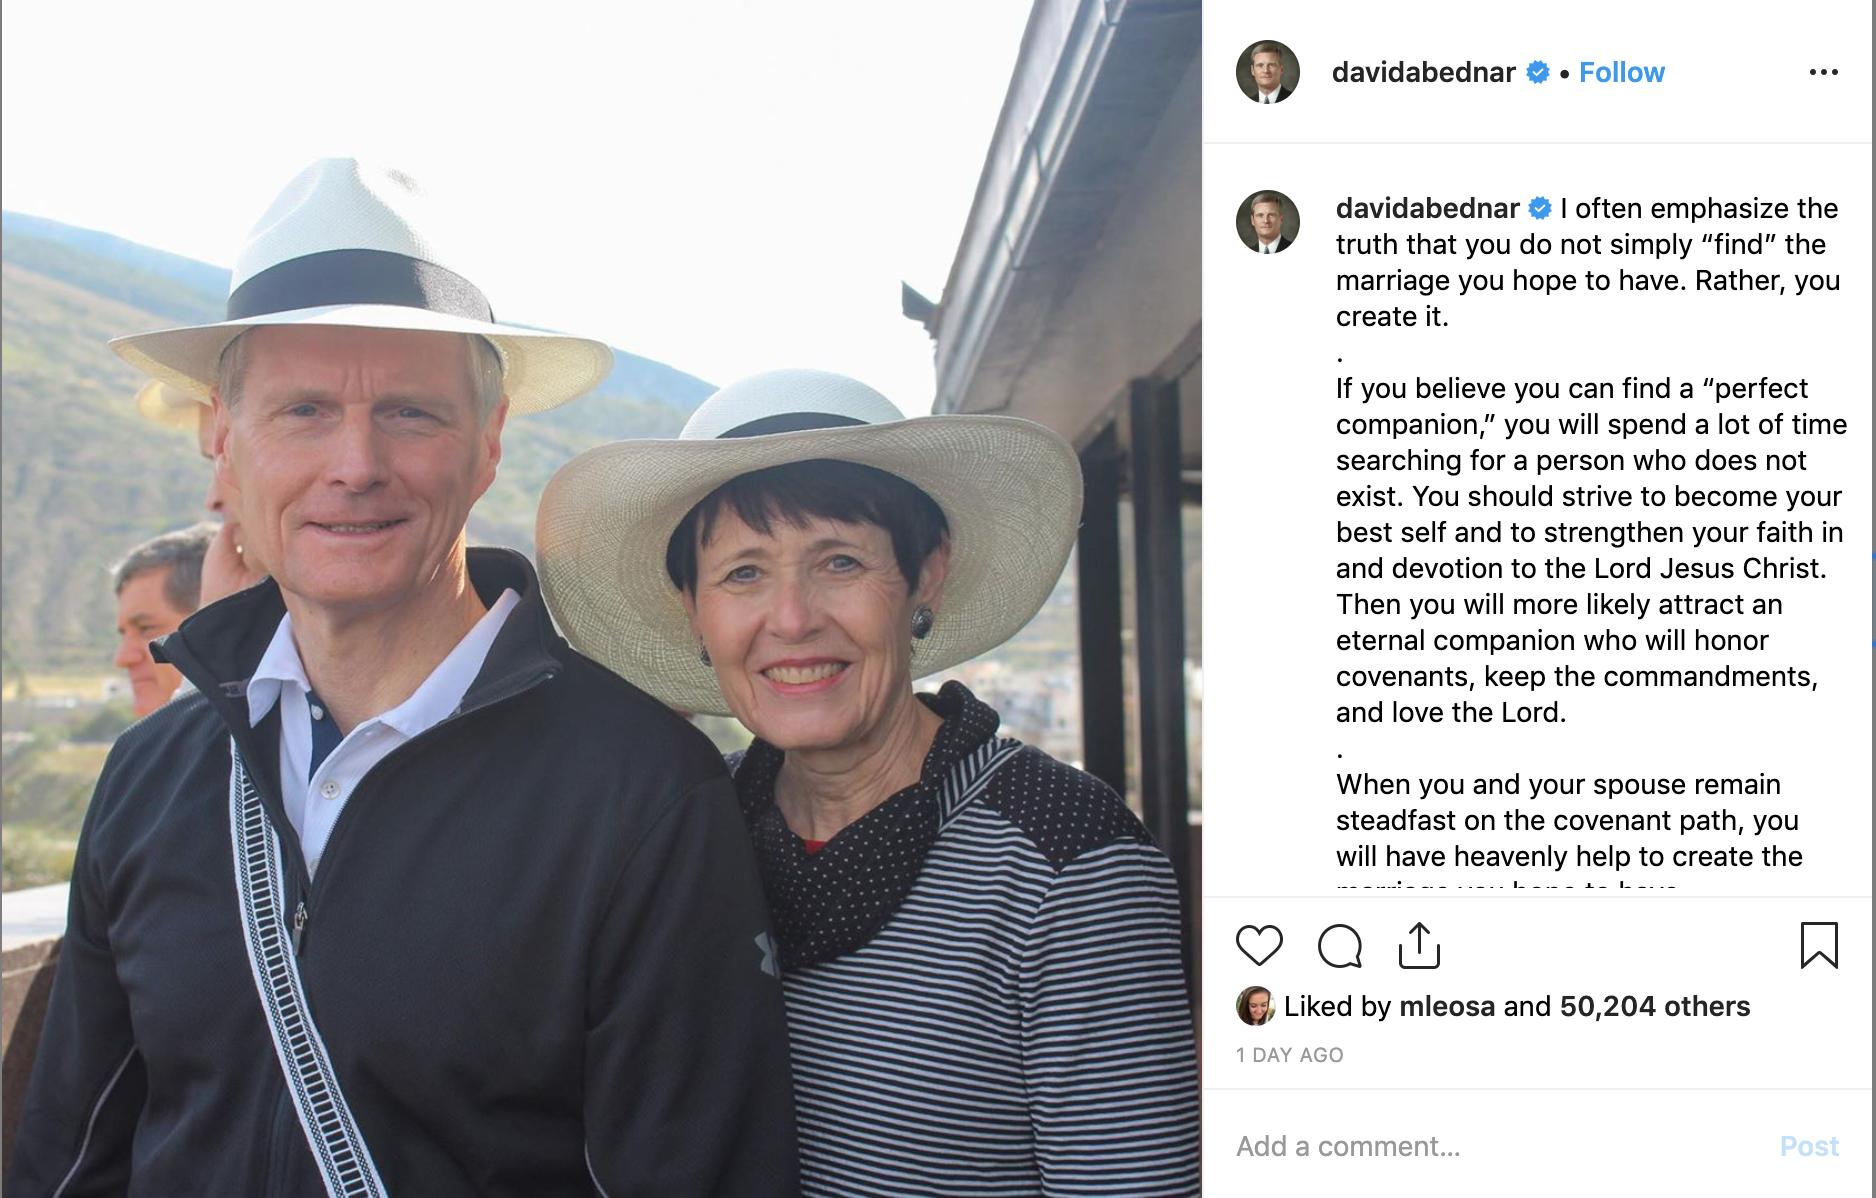 Elder David A. Bednar shares advice on finding an eternal companion, on Wednesday, June 12, 2019.